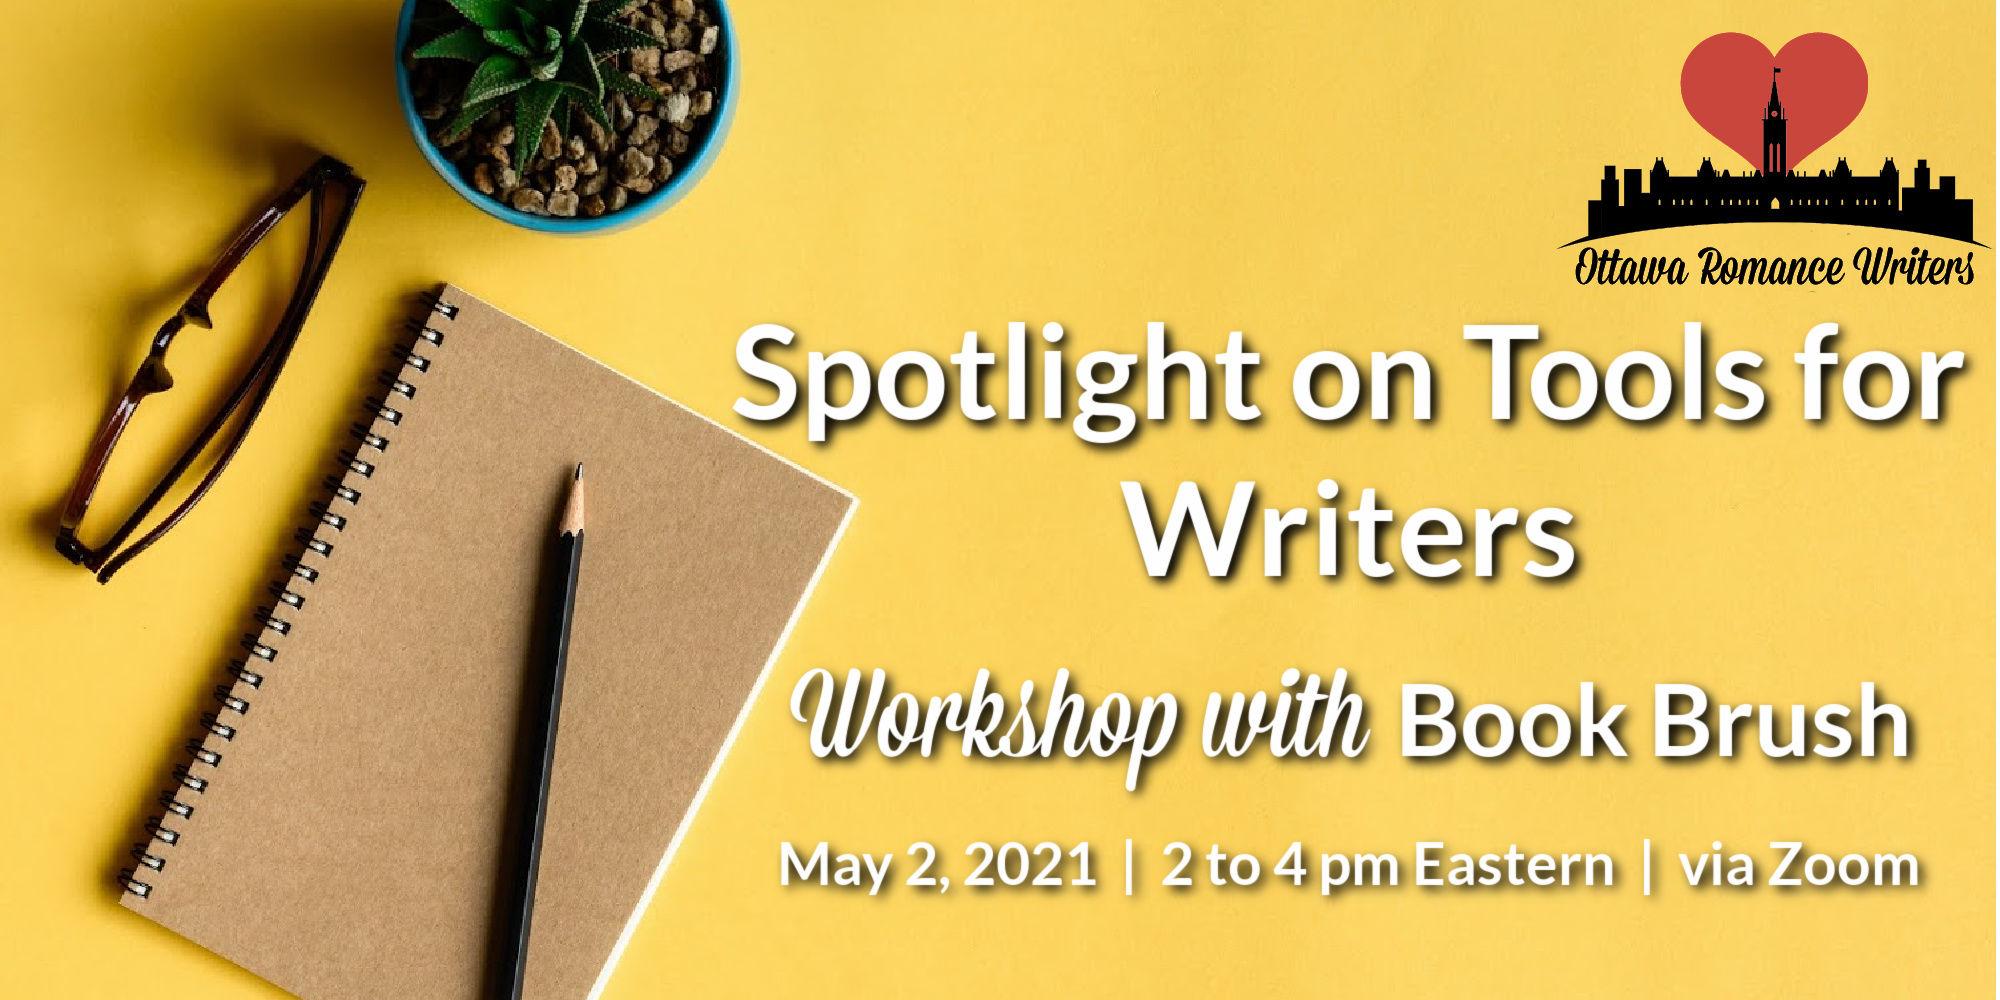 May 2, 2021 Workshop – Book Brush with Kathleen Sweeney